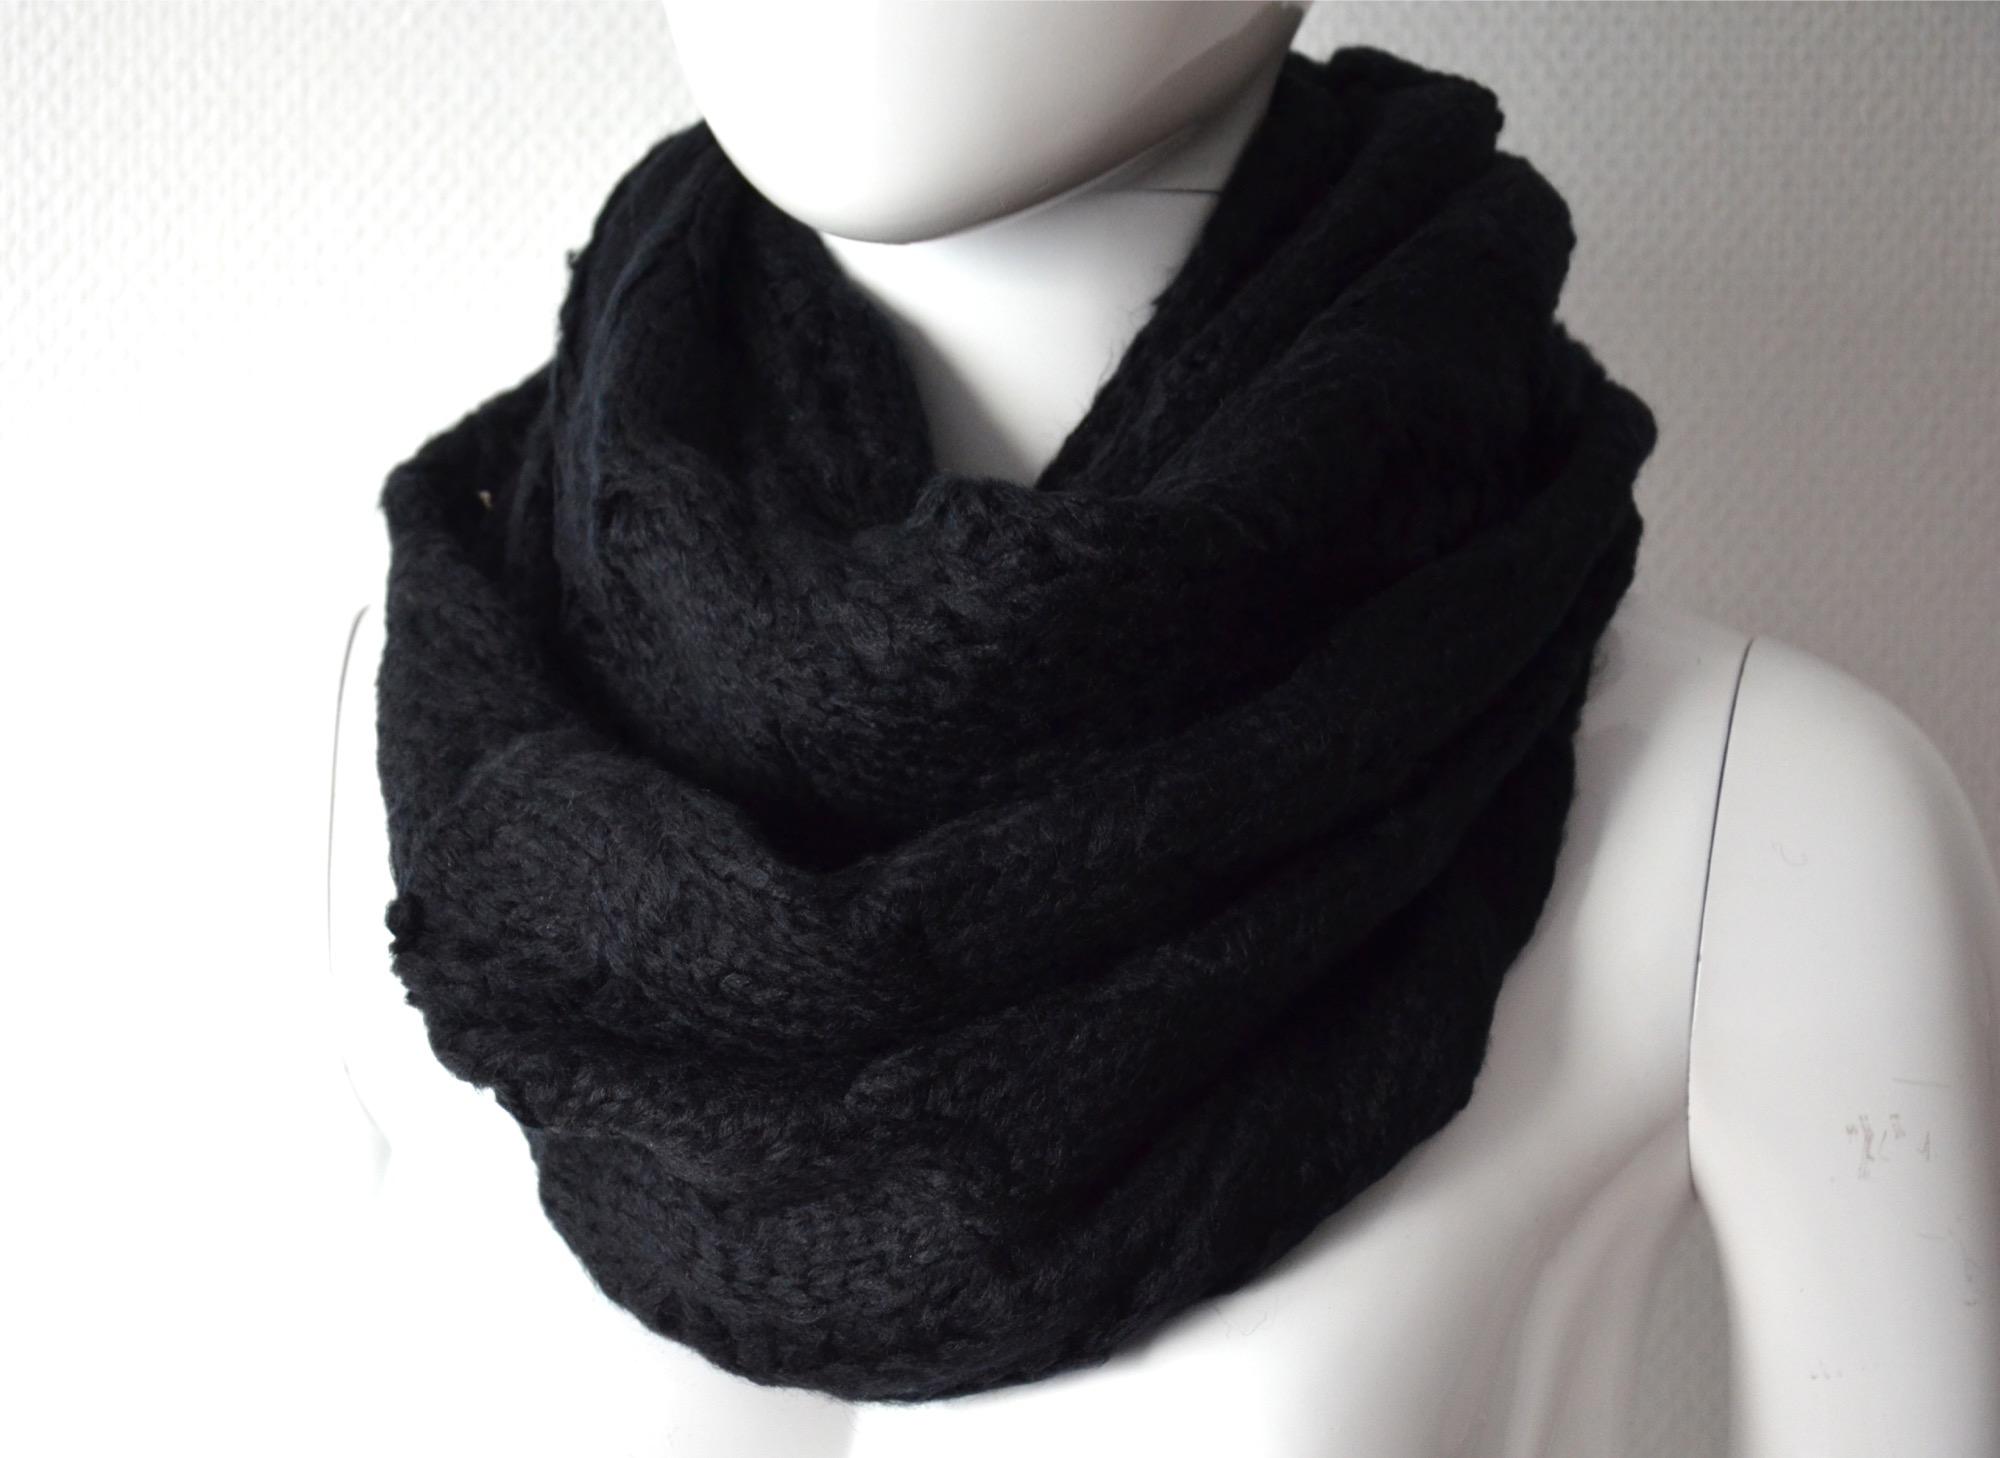 psv56 echarpe snood tube tour de cou automne hiver maille style pull tricot mode femme noir. Black Bedroom Furniture Sets. Home Design Ideas